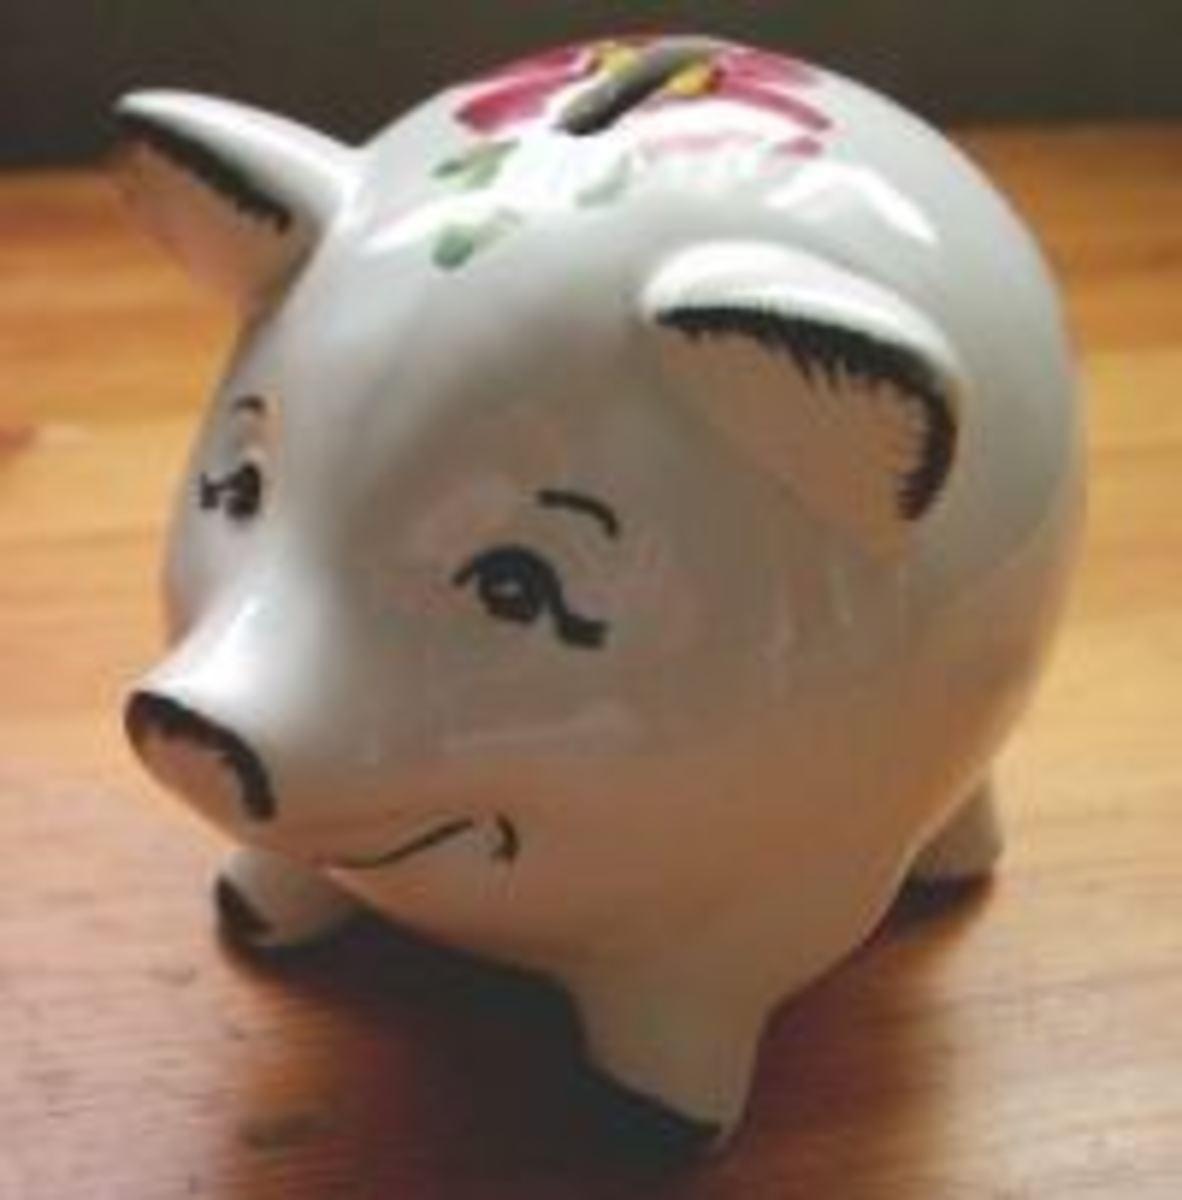 piggybank.jpg